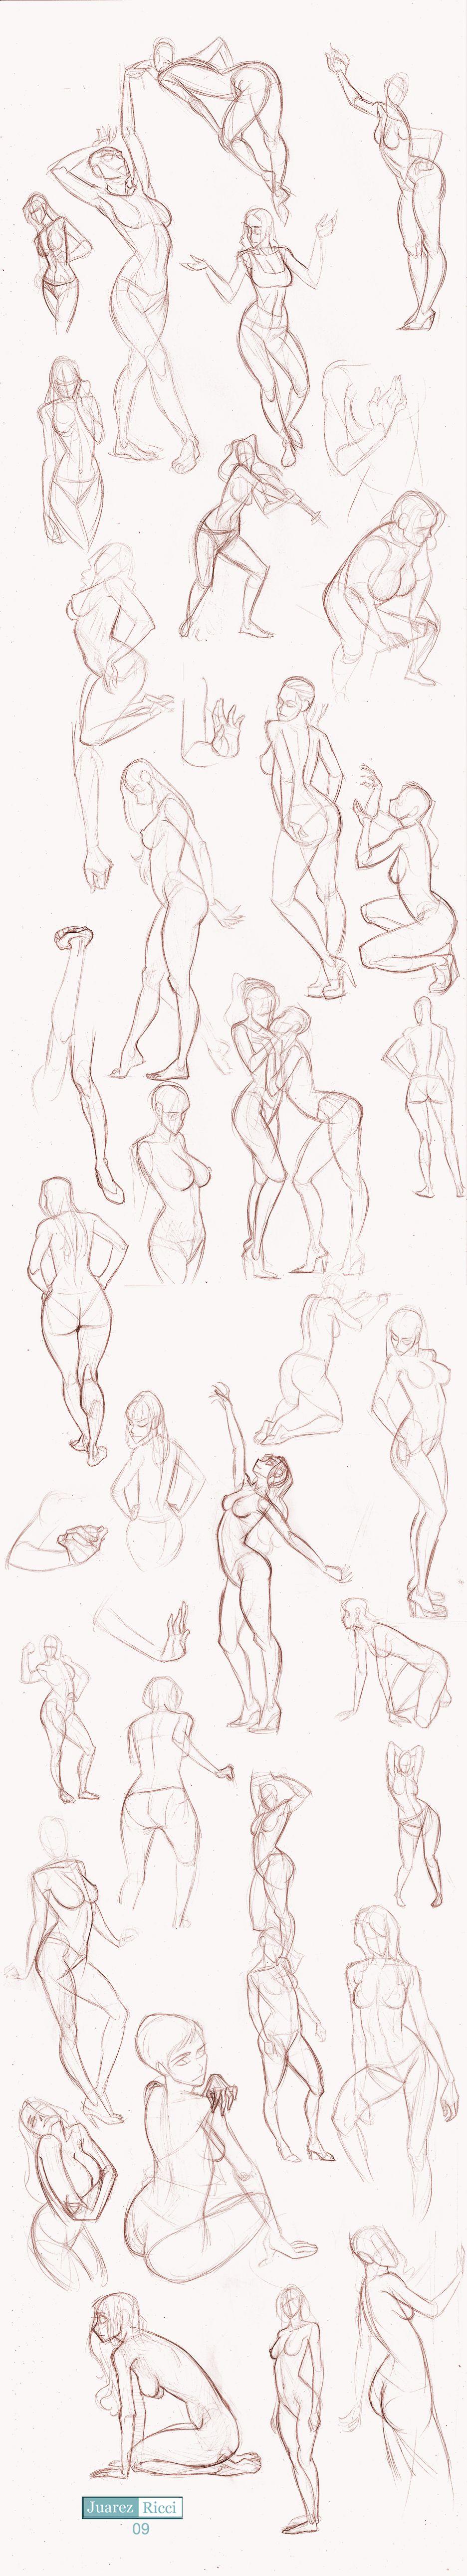 Studies Part II by juarezricci.deviantart.com on @deviantART ...